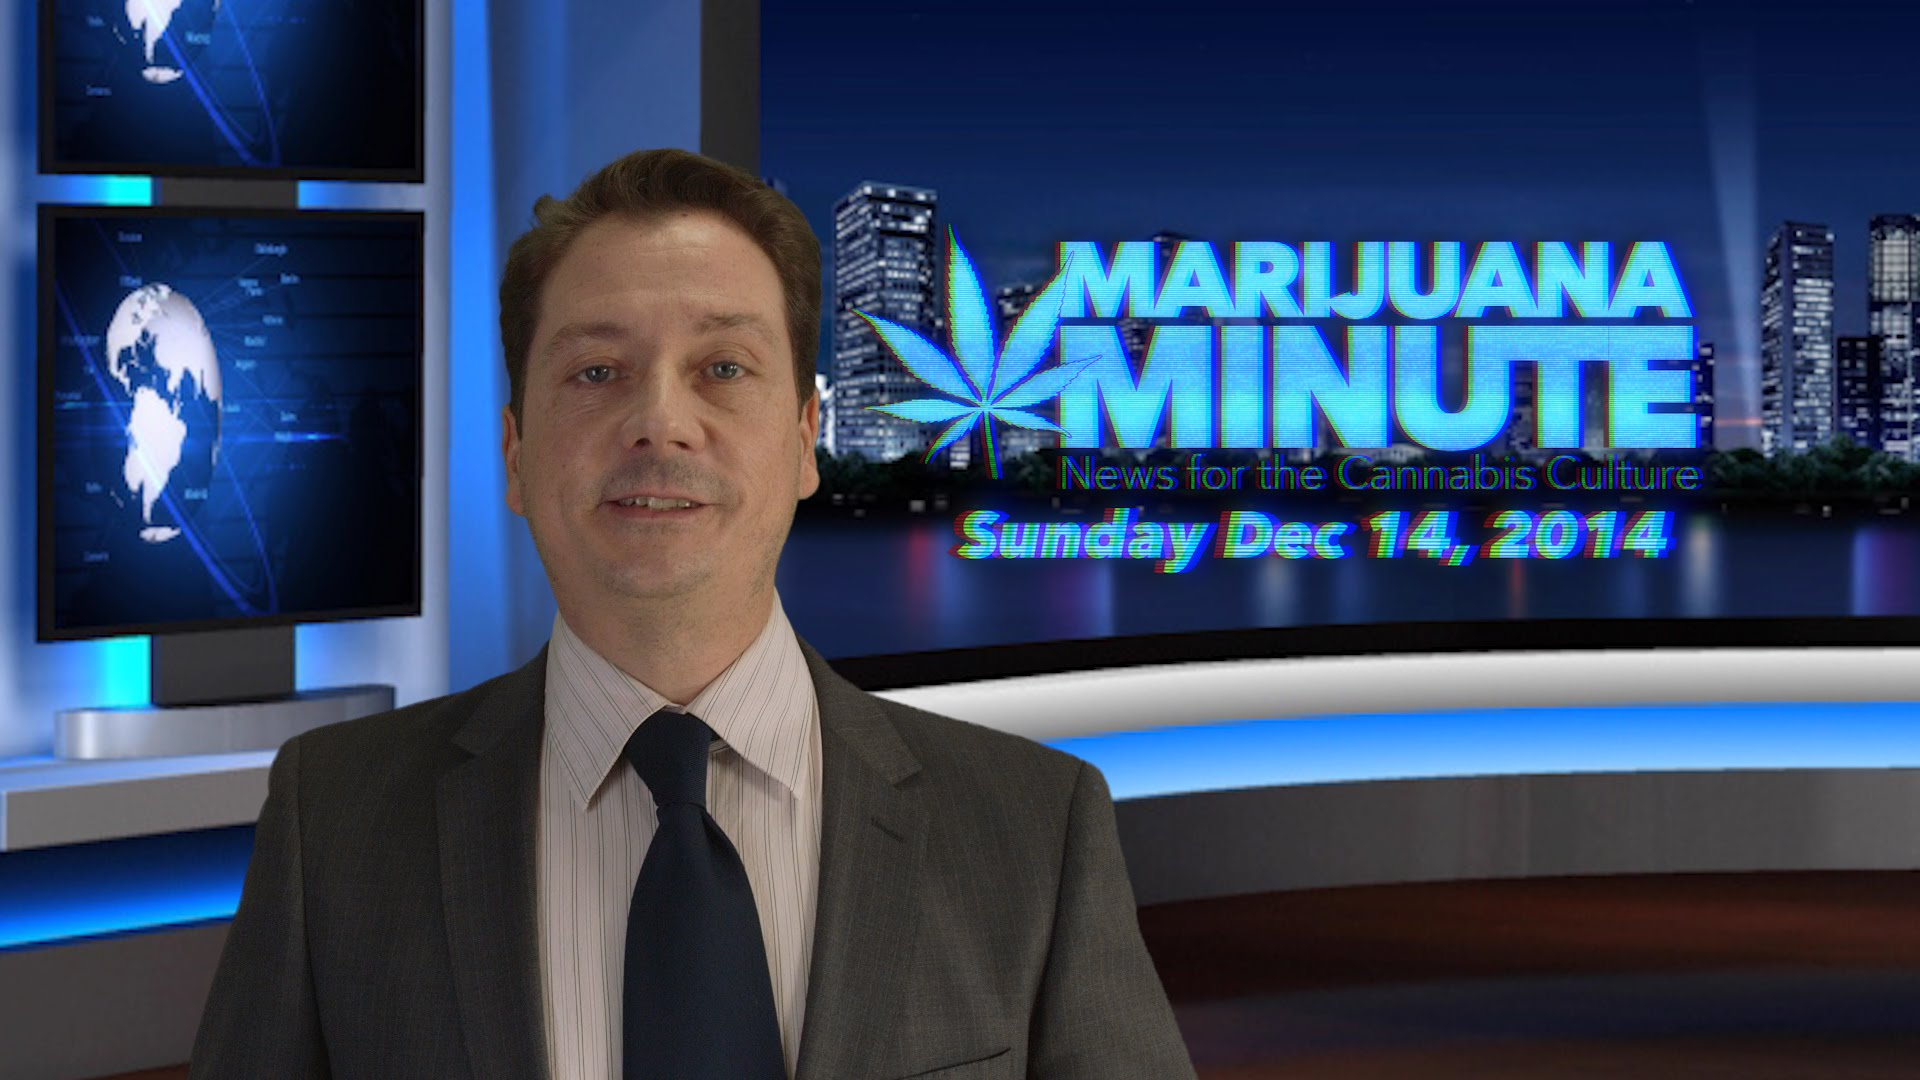 Marijuana Minute, Dec 14 2014: Feds Send Mixed Message on Legal Cannabis in Spending Bill